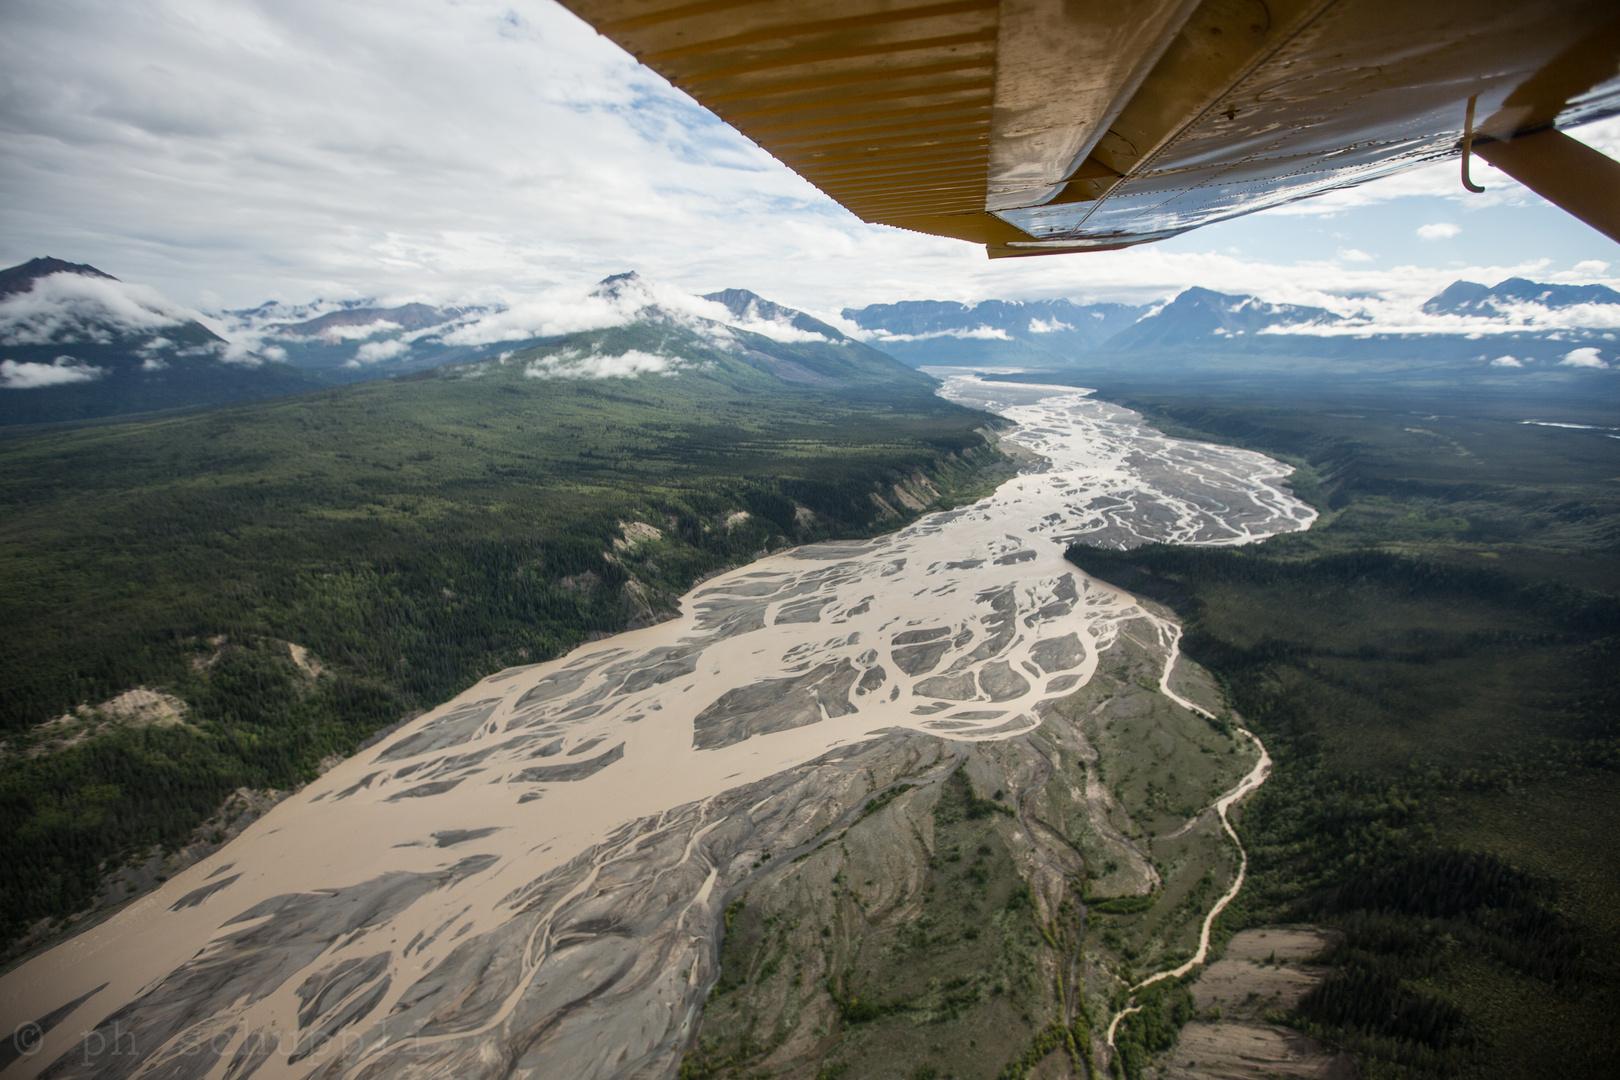 Copper River Wrangell St. Elias Nationalpark